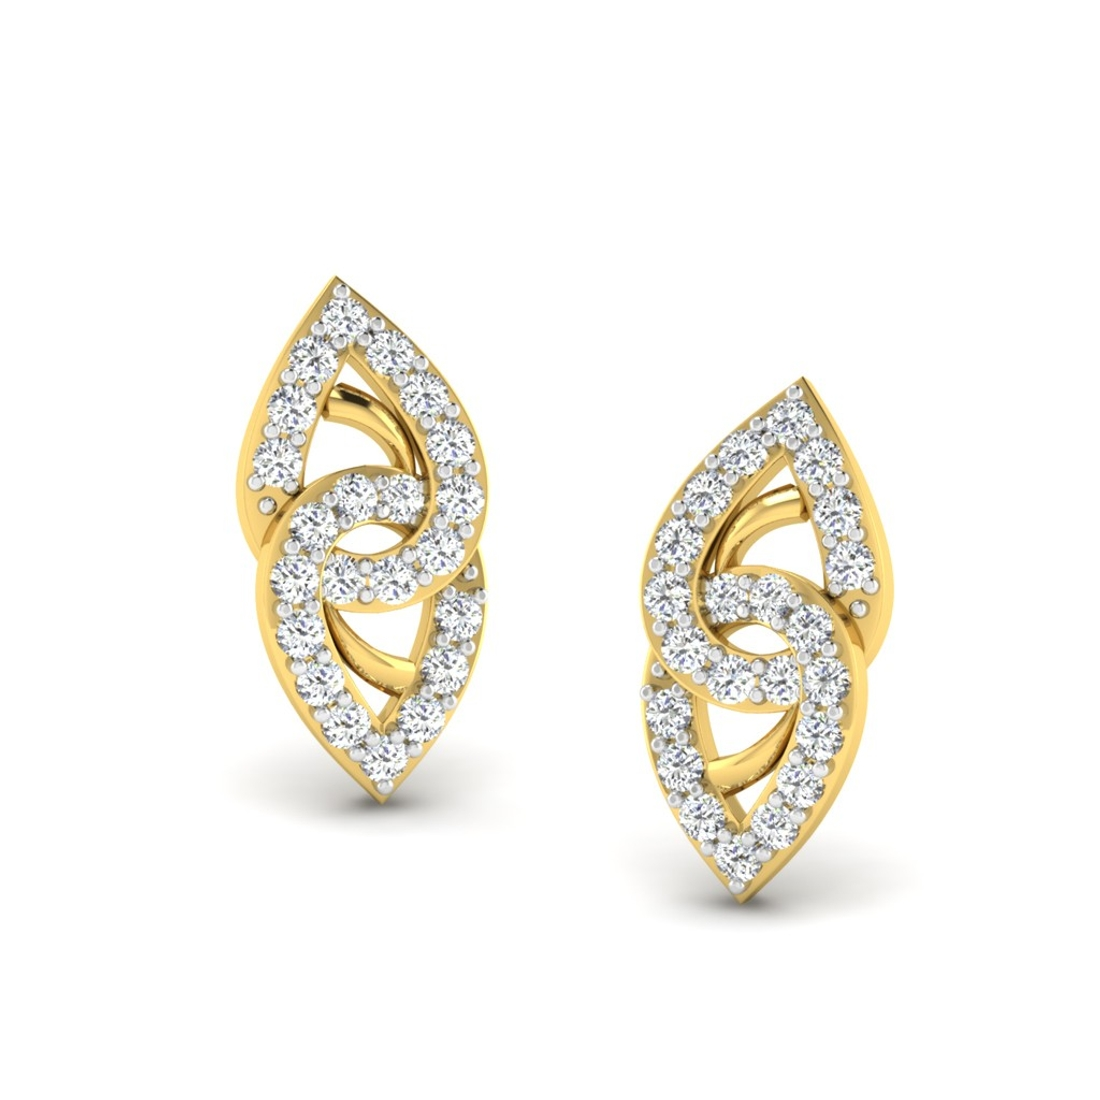 Sarvada Jewels' The Linked Ocular Earrings